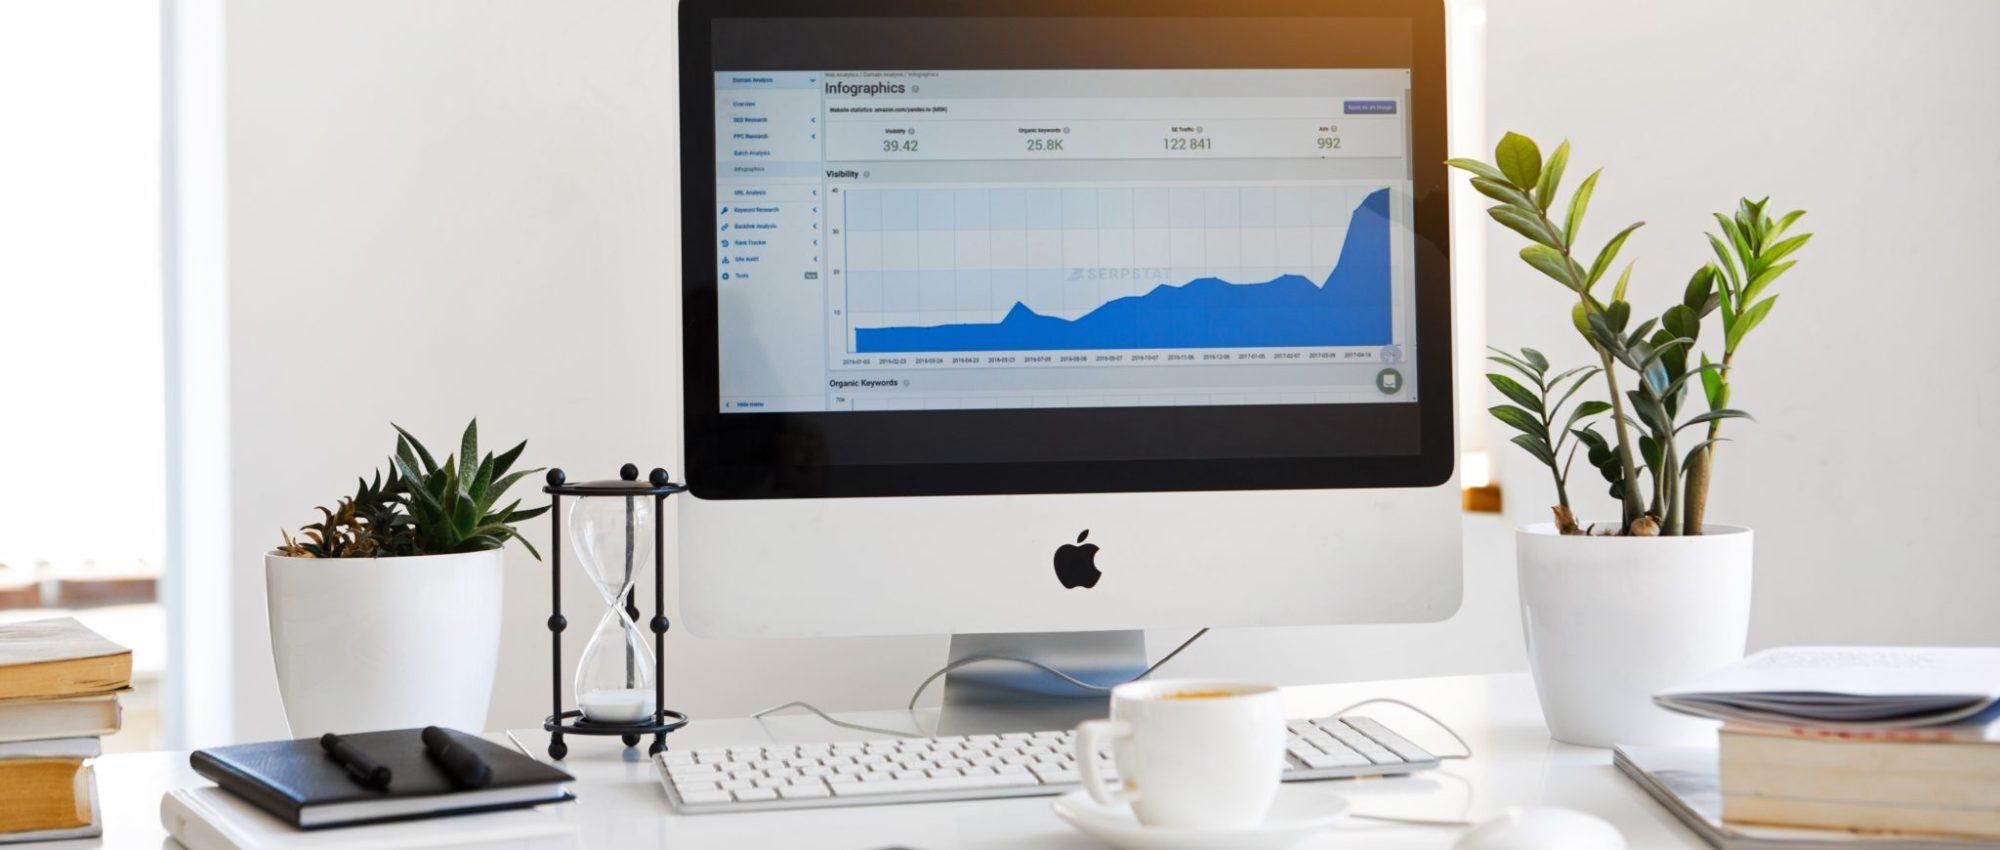 Data Analysis Training Courses - School Data Analysis - Zen PD